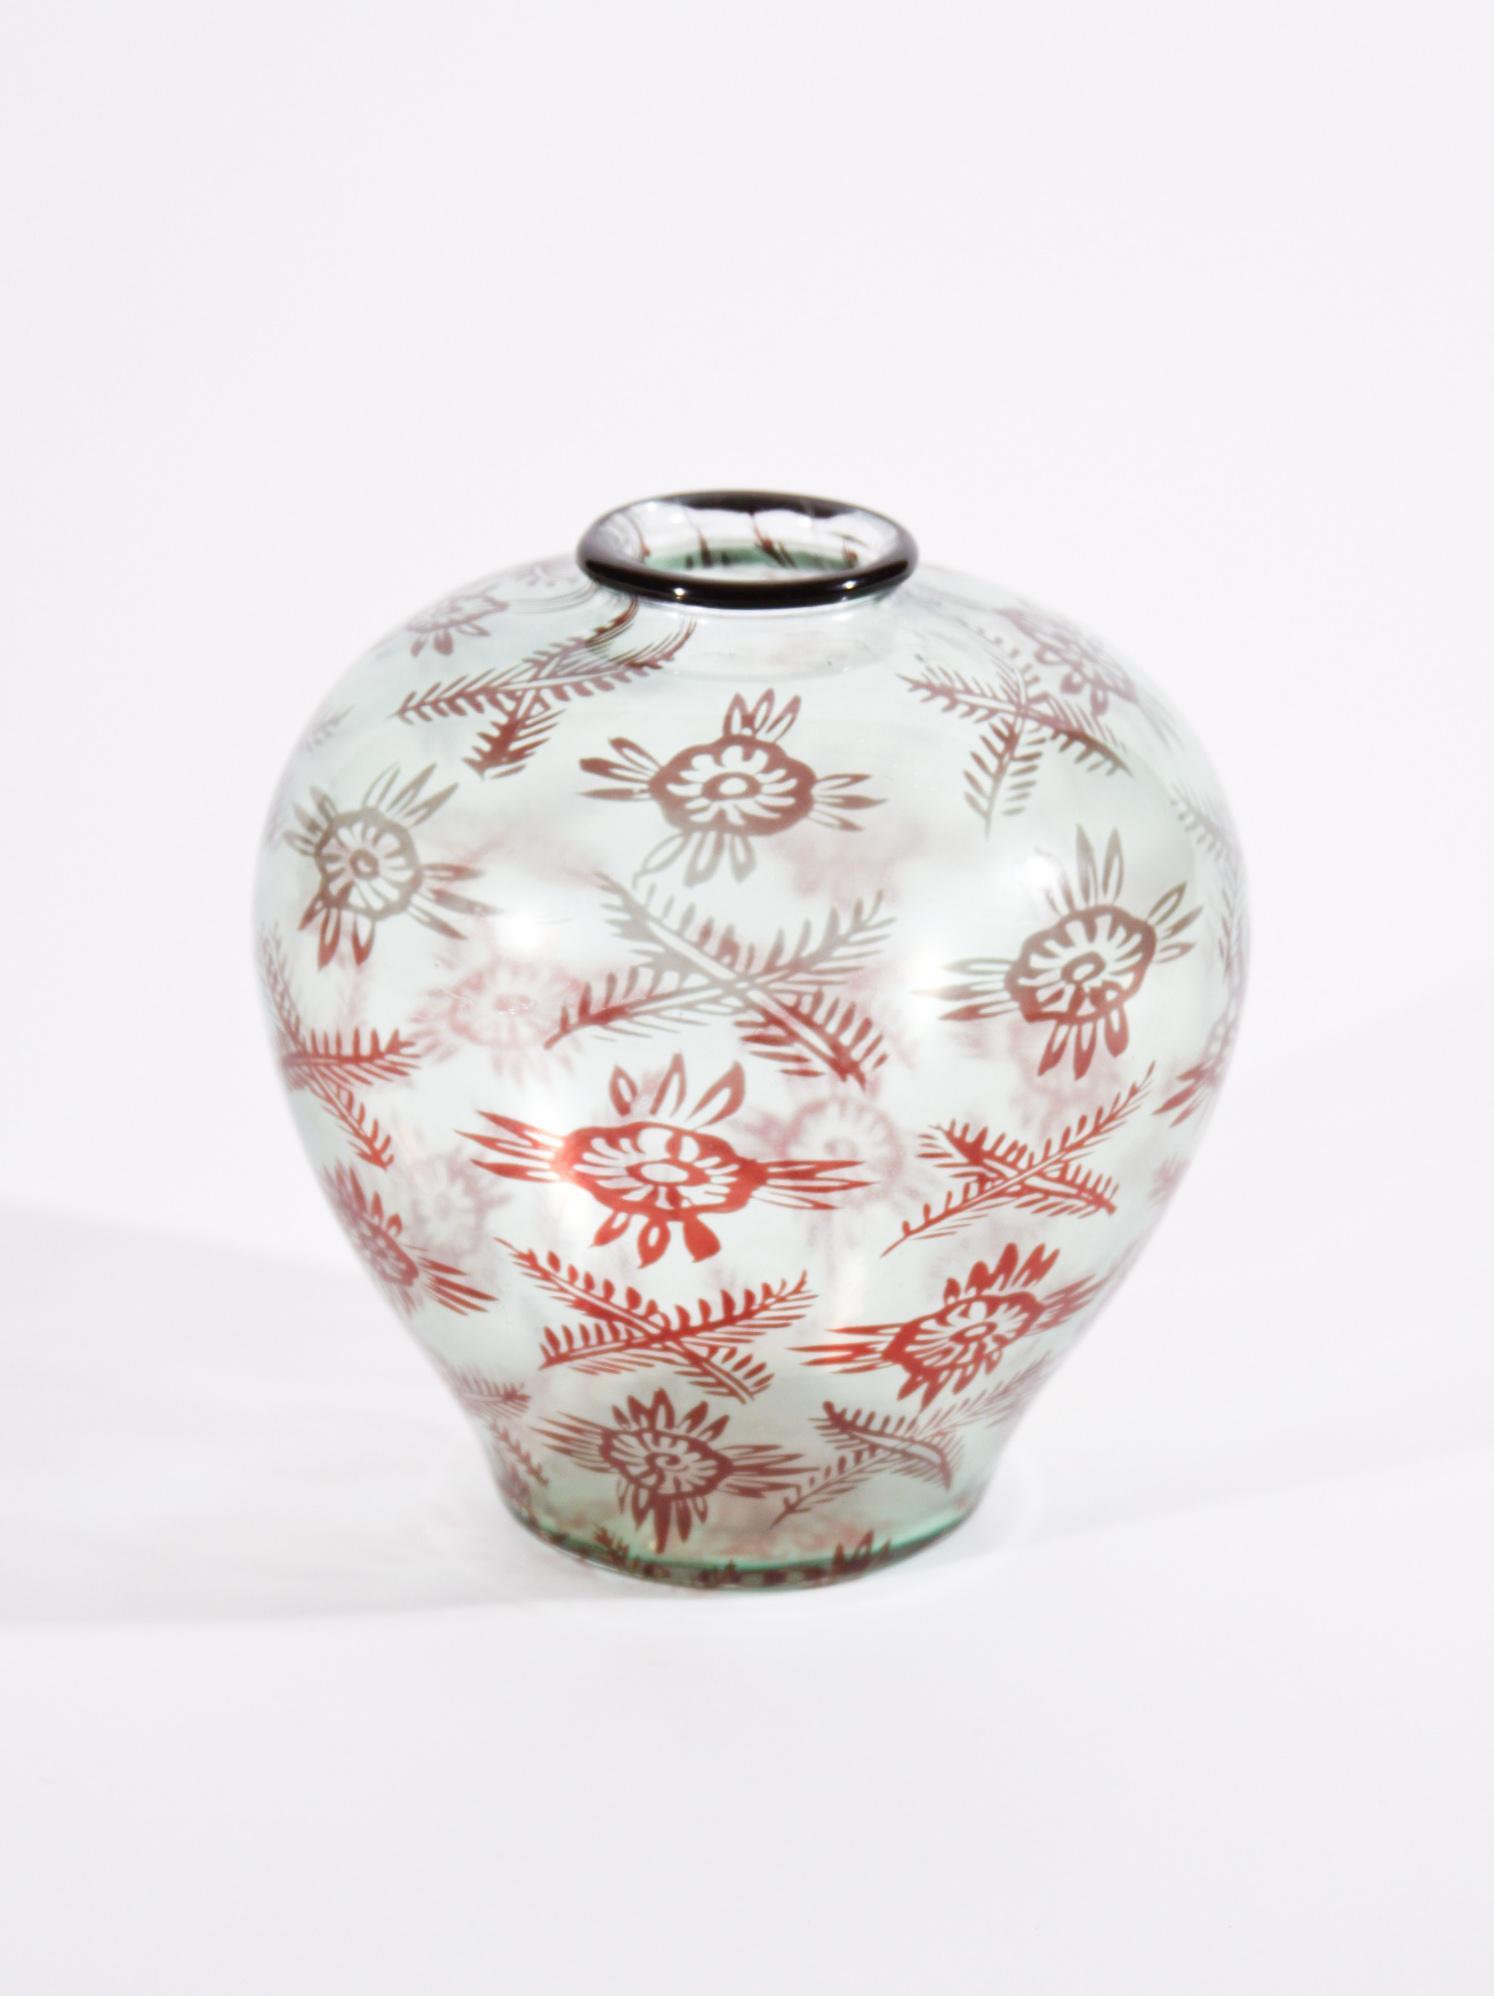 Orrefors 'Graal' Glass Vase 1